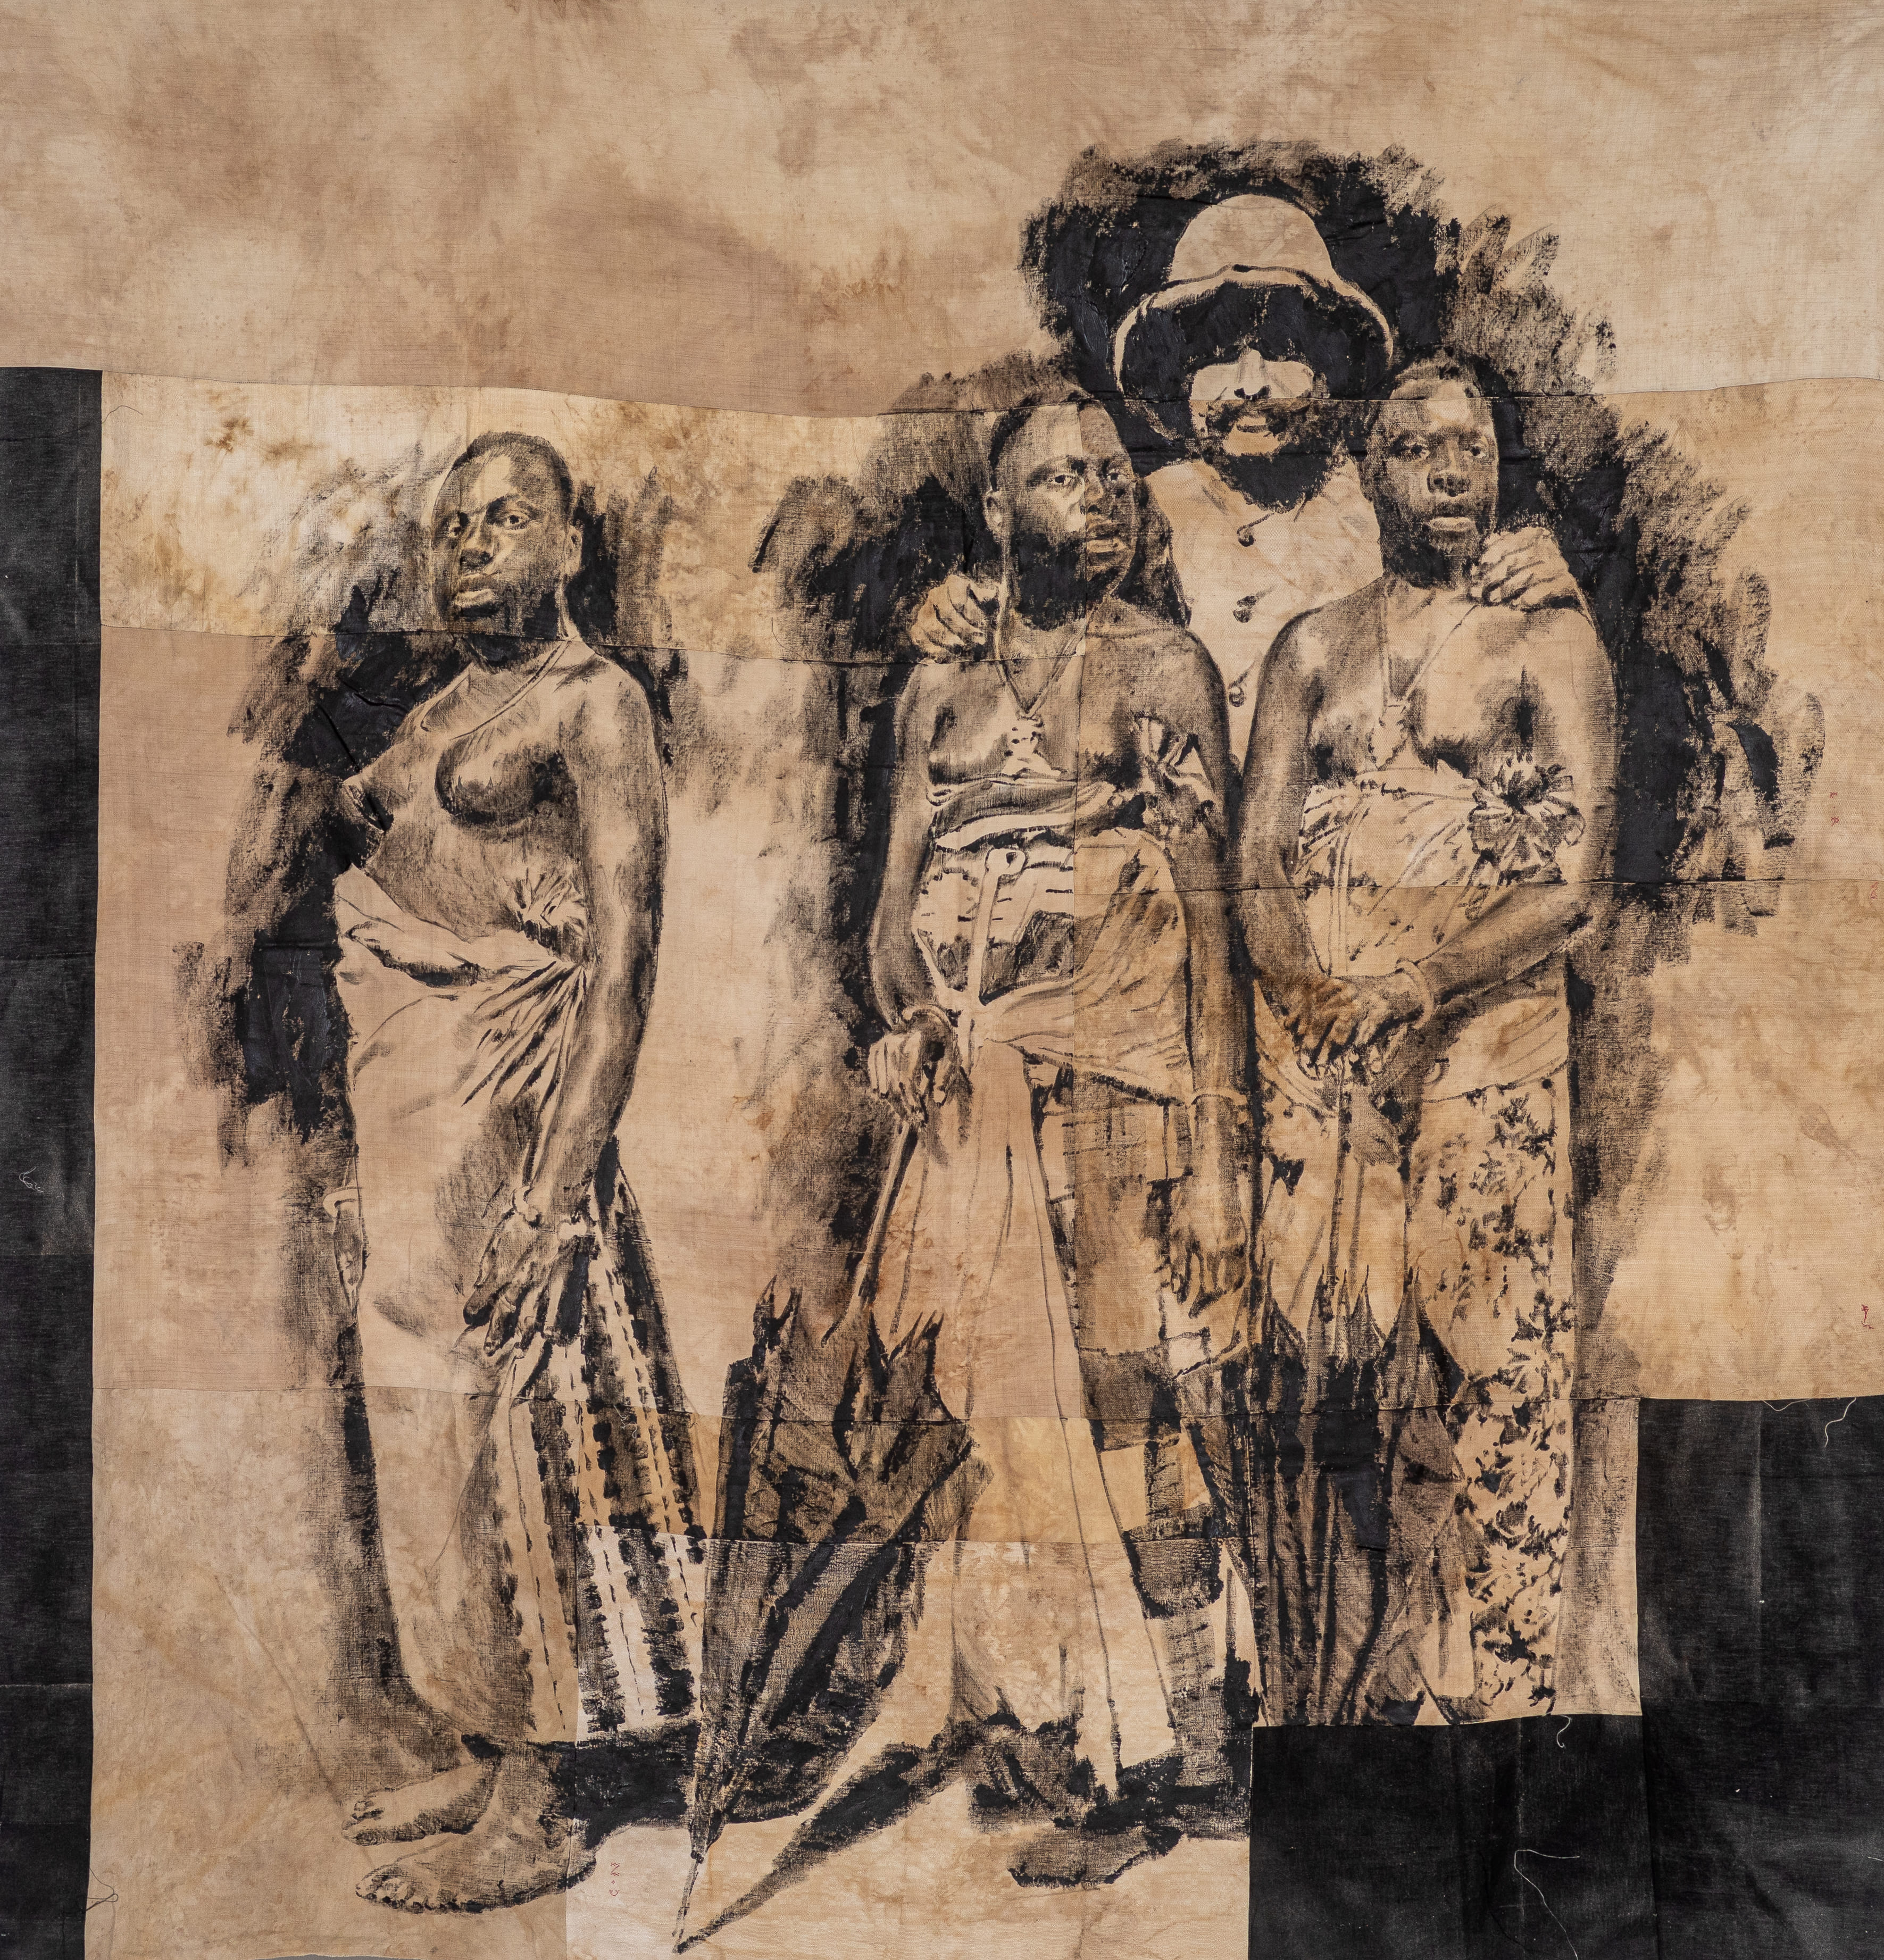 Galerie_Fakhoury - 13-09-2020 - HD - JPG (sRVB) (6 of 31)